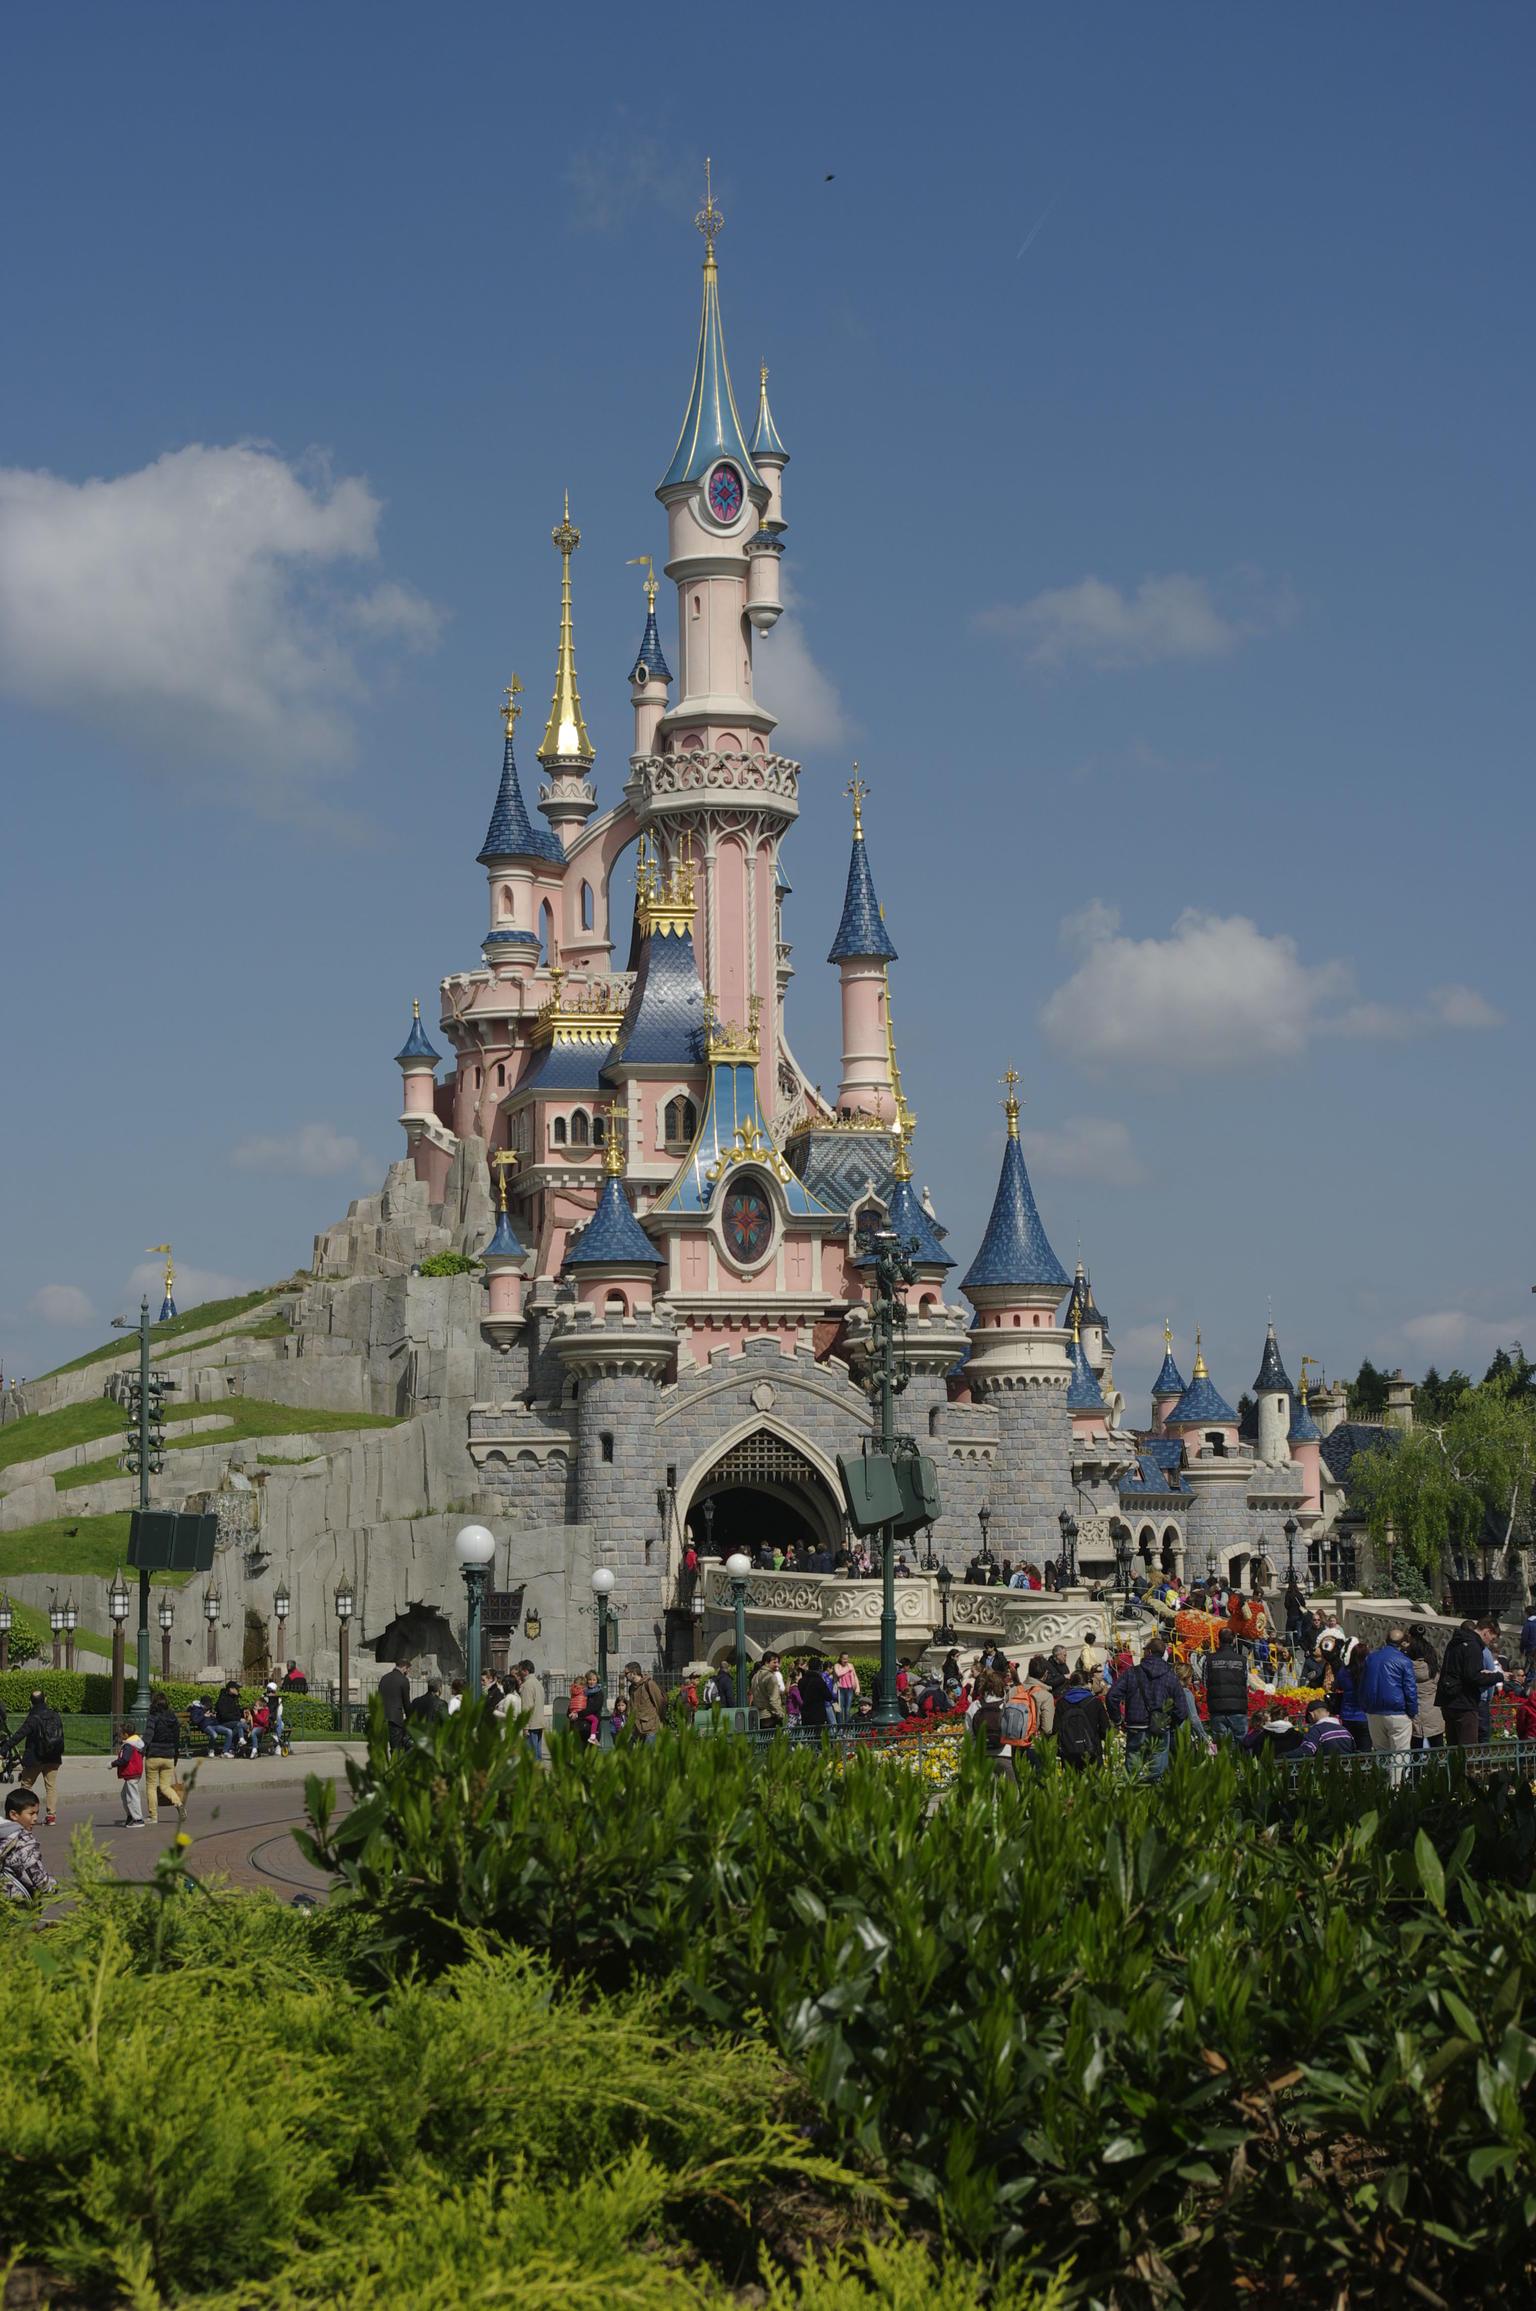 Viaje inolvidable a Disneyland París